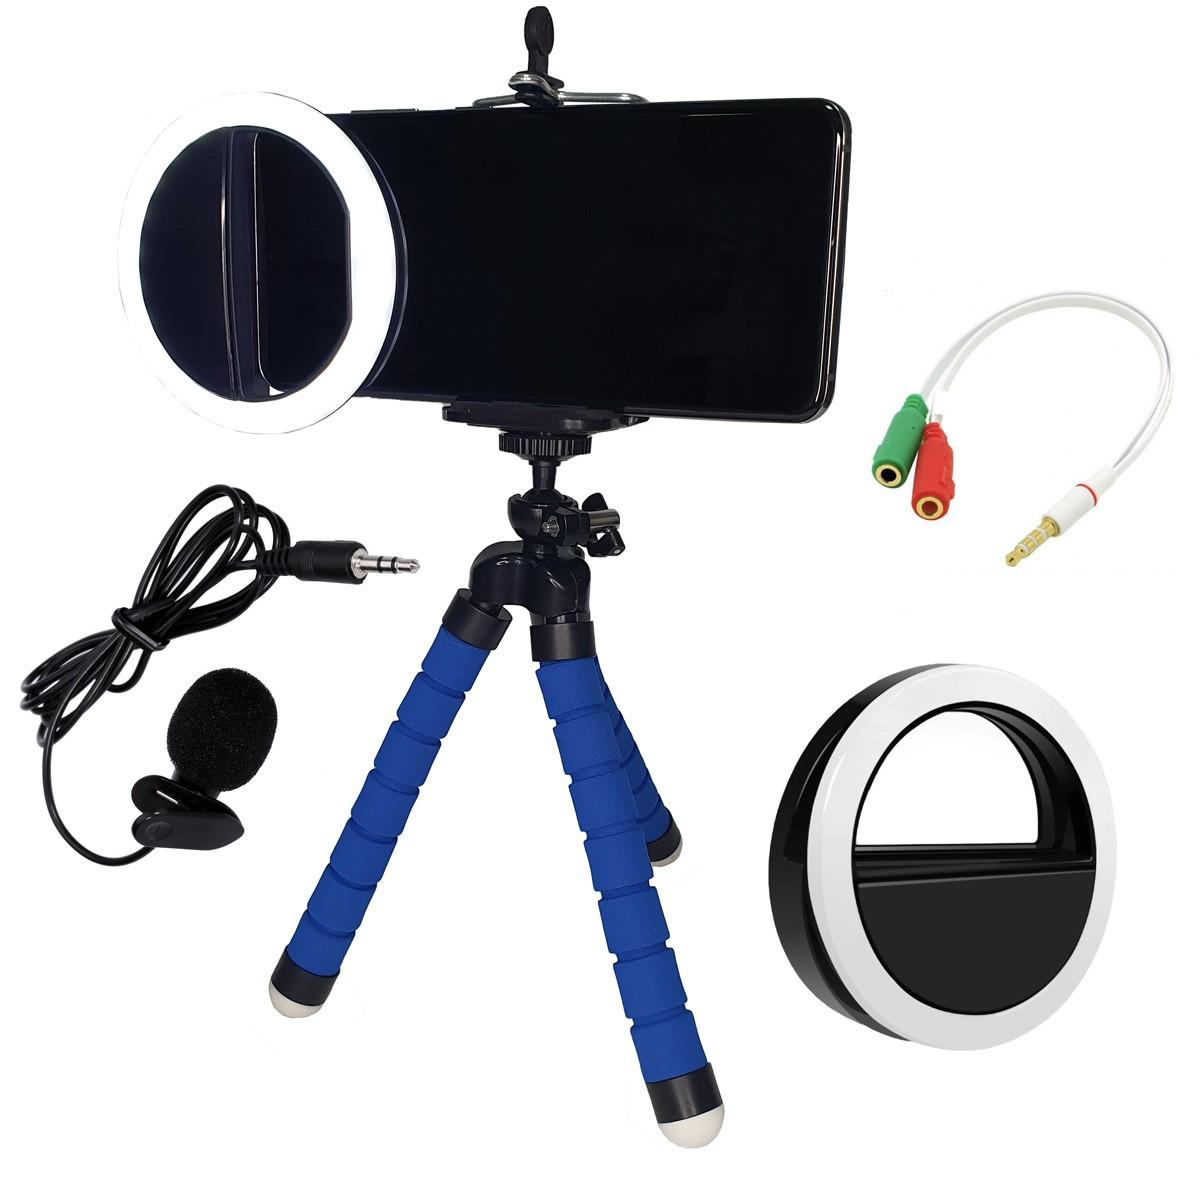 Kit Youtuber Stories com Tripé Microfone Ring Light Selfie Cabo Adaptador